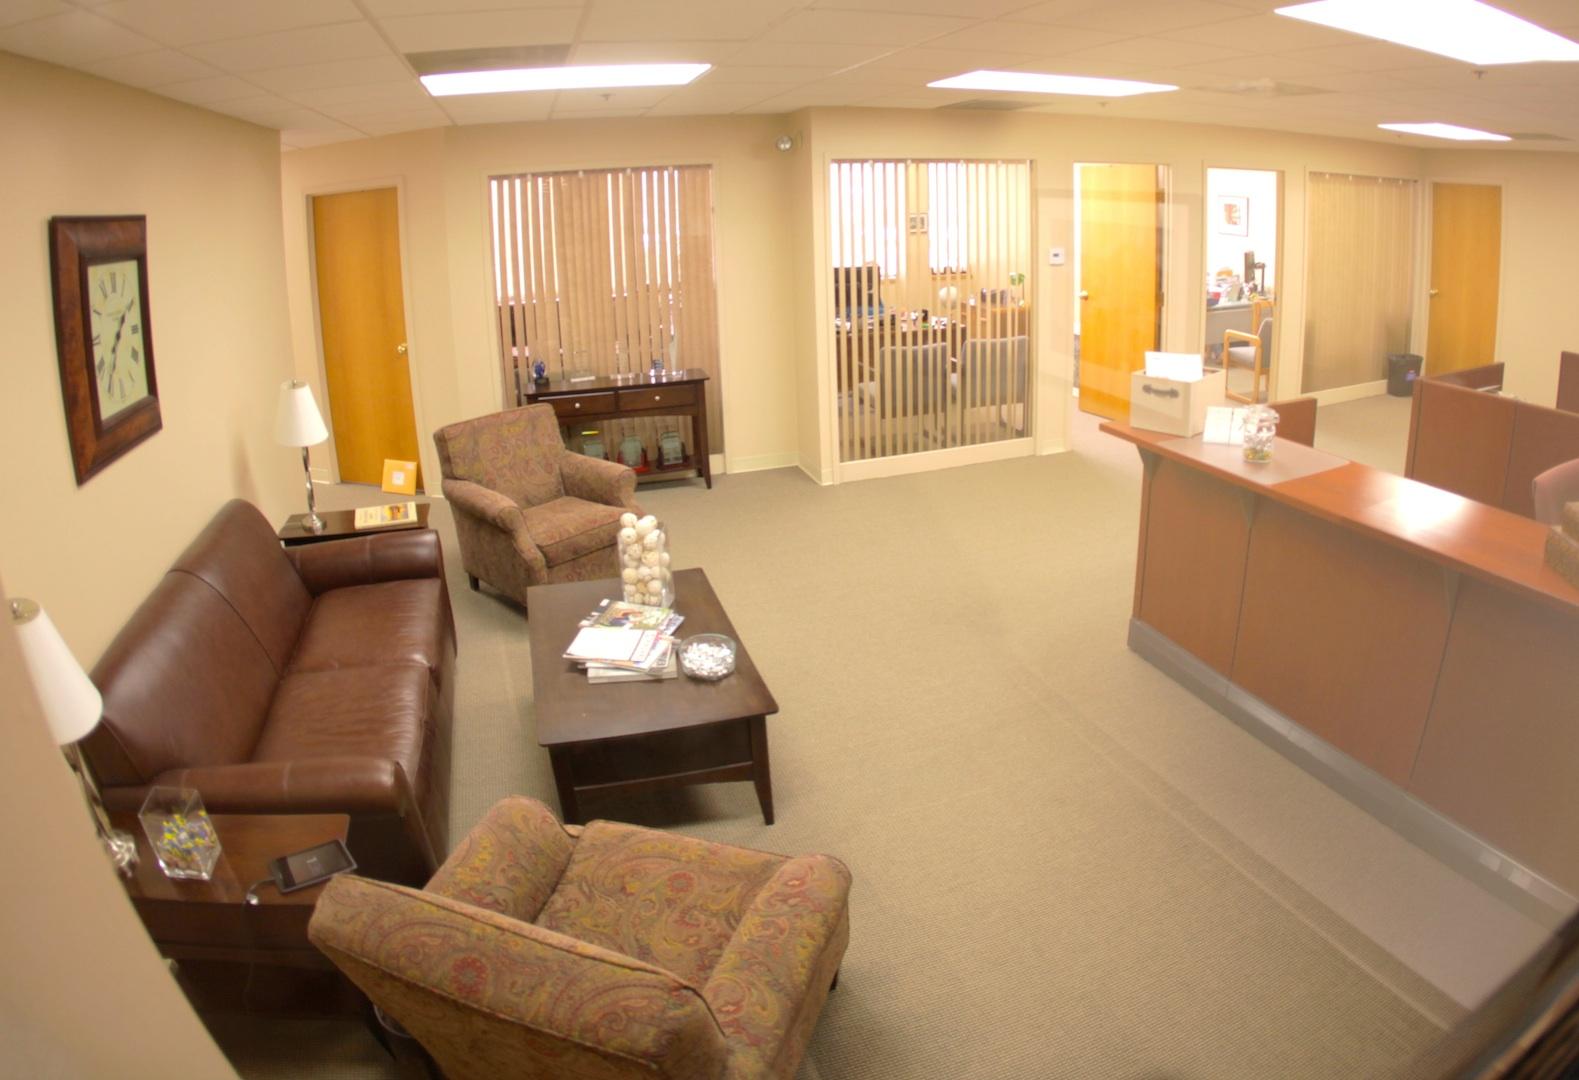 Typical Reception area copy.jpg